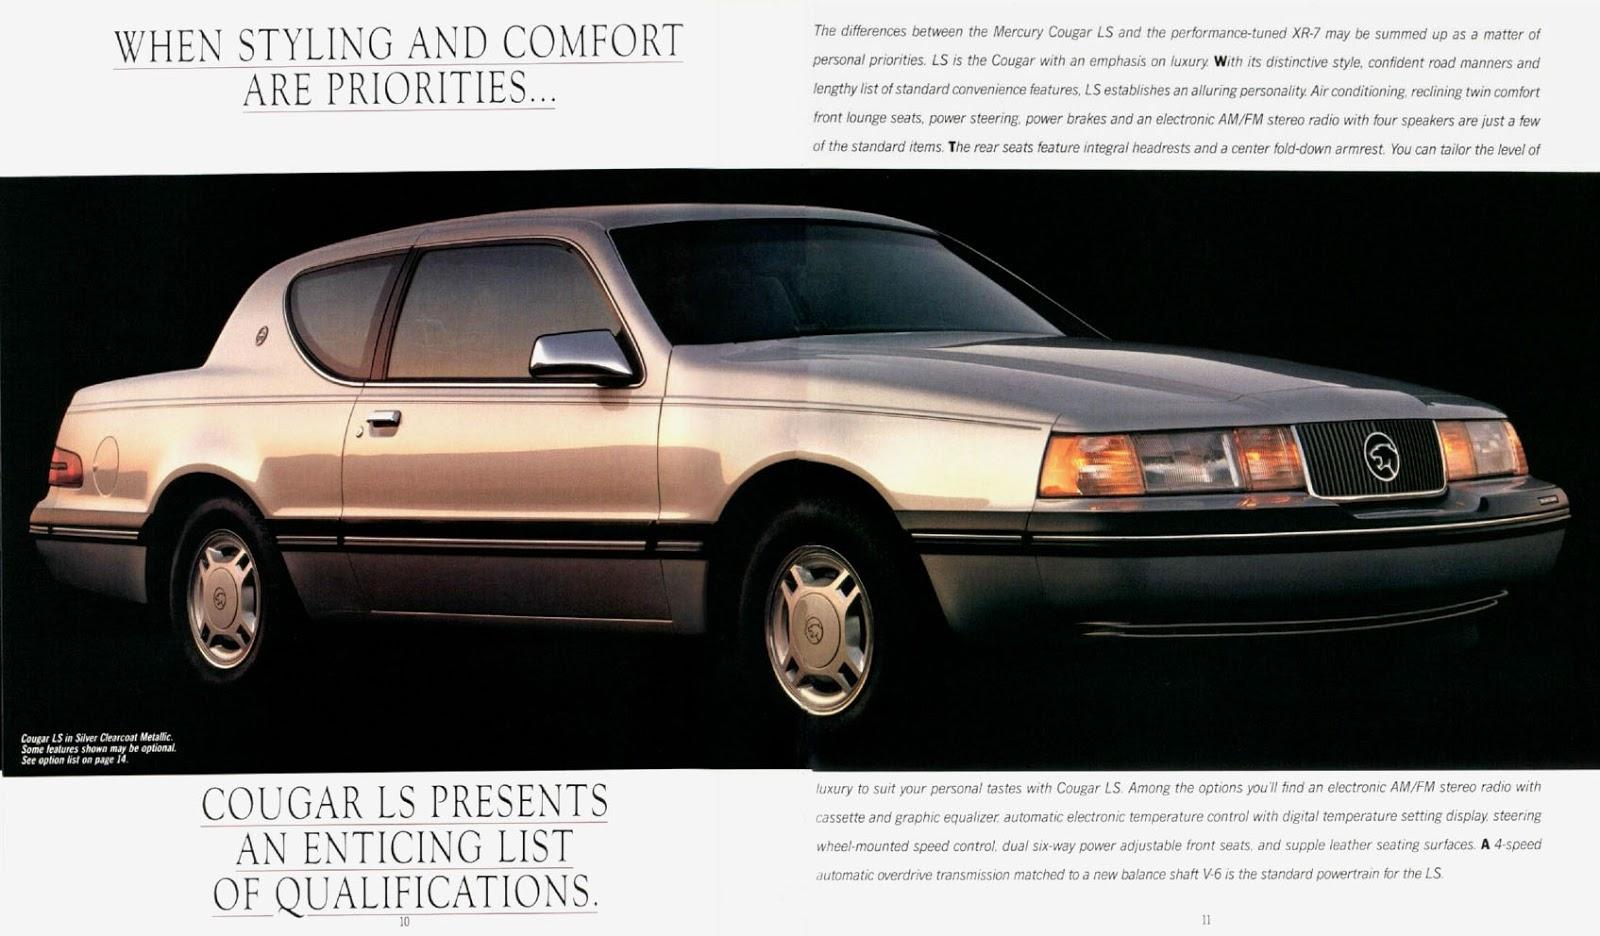 REVolution: 1983-1988 Mercury Cougar